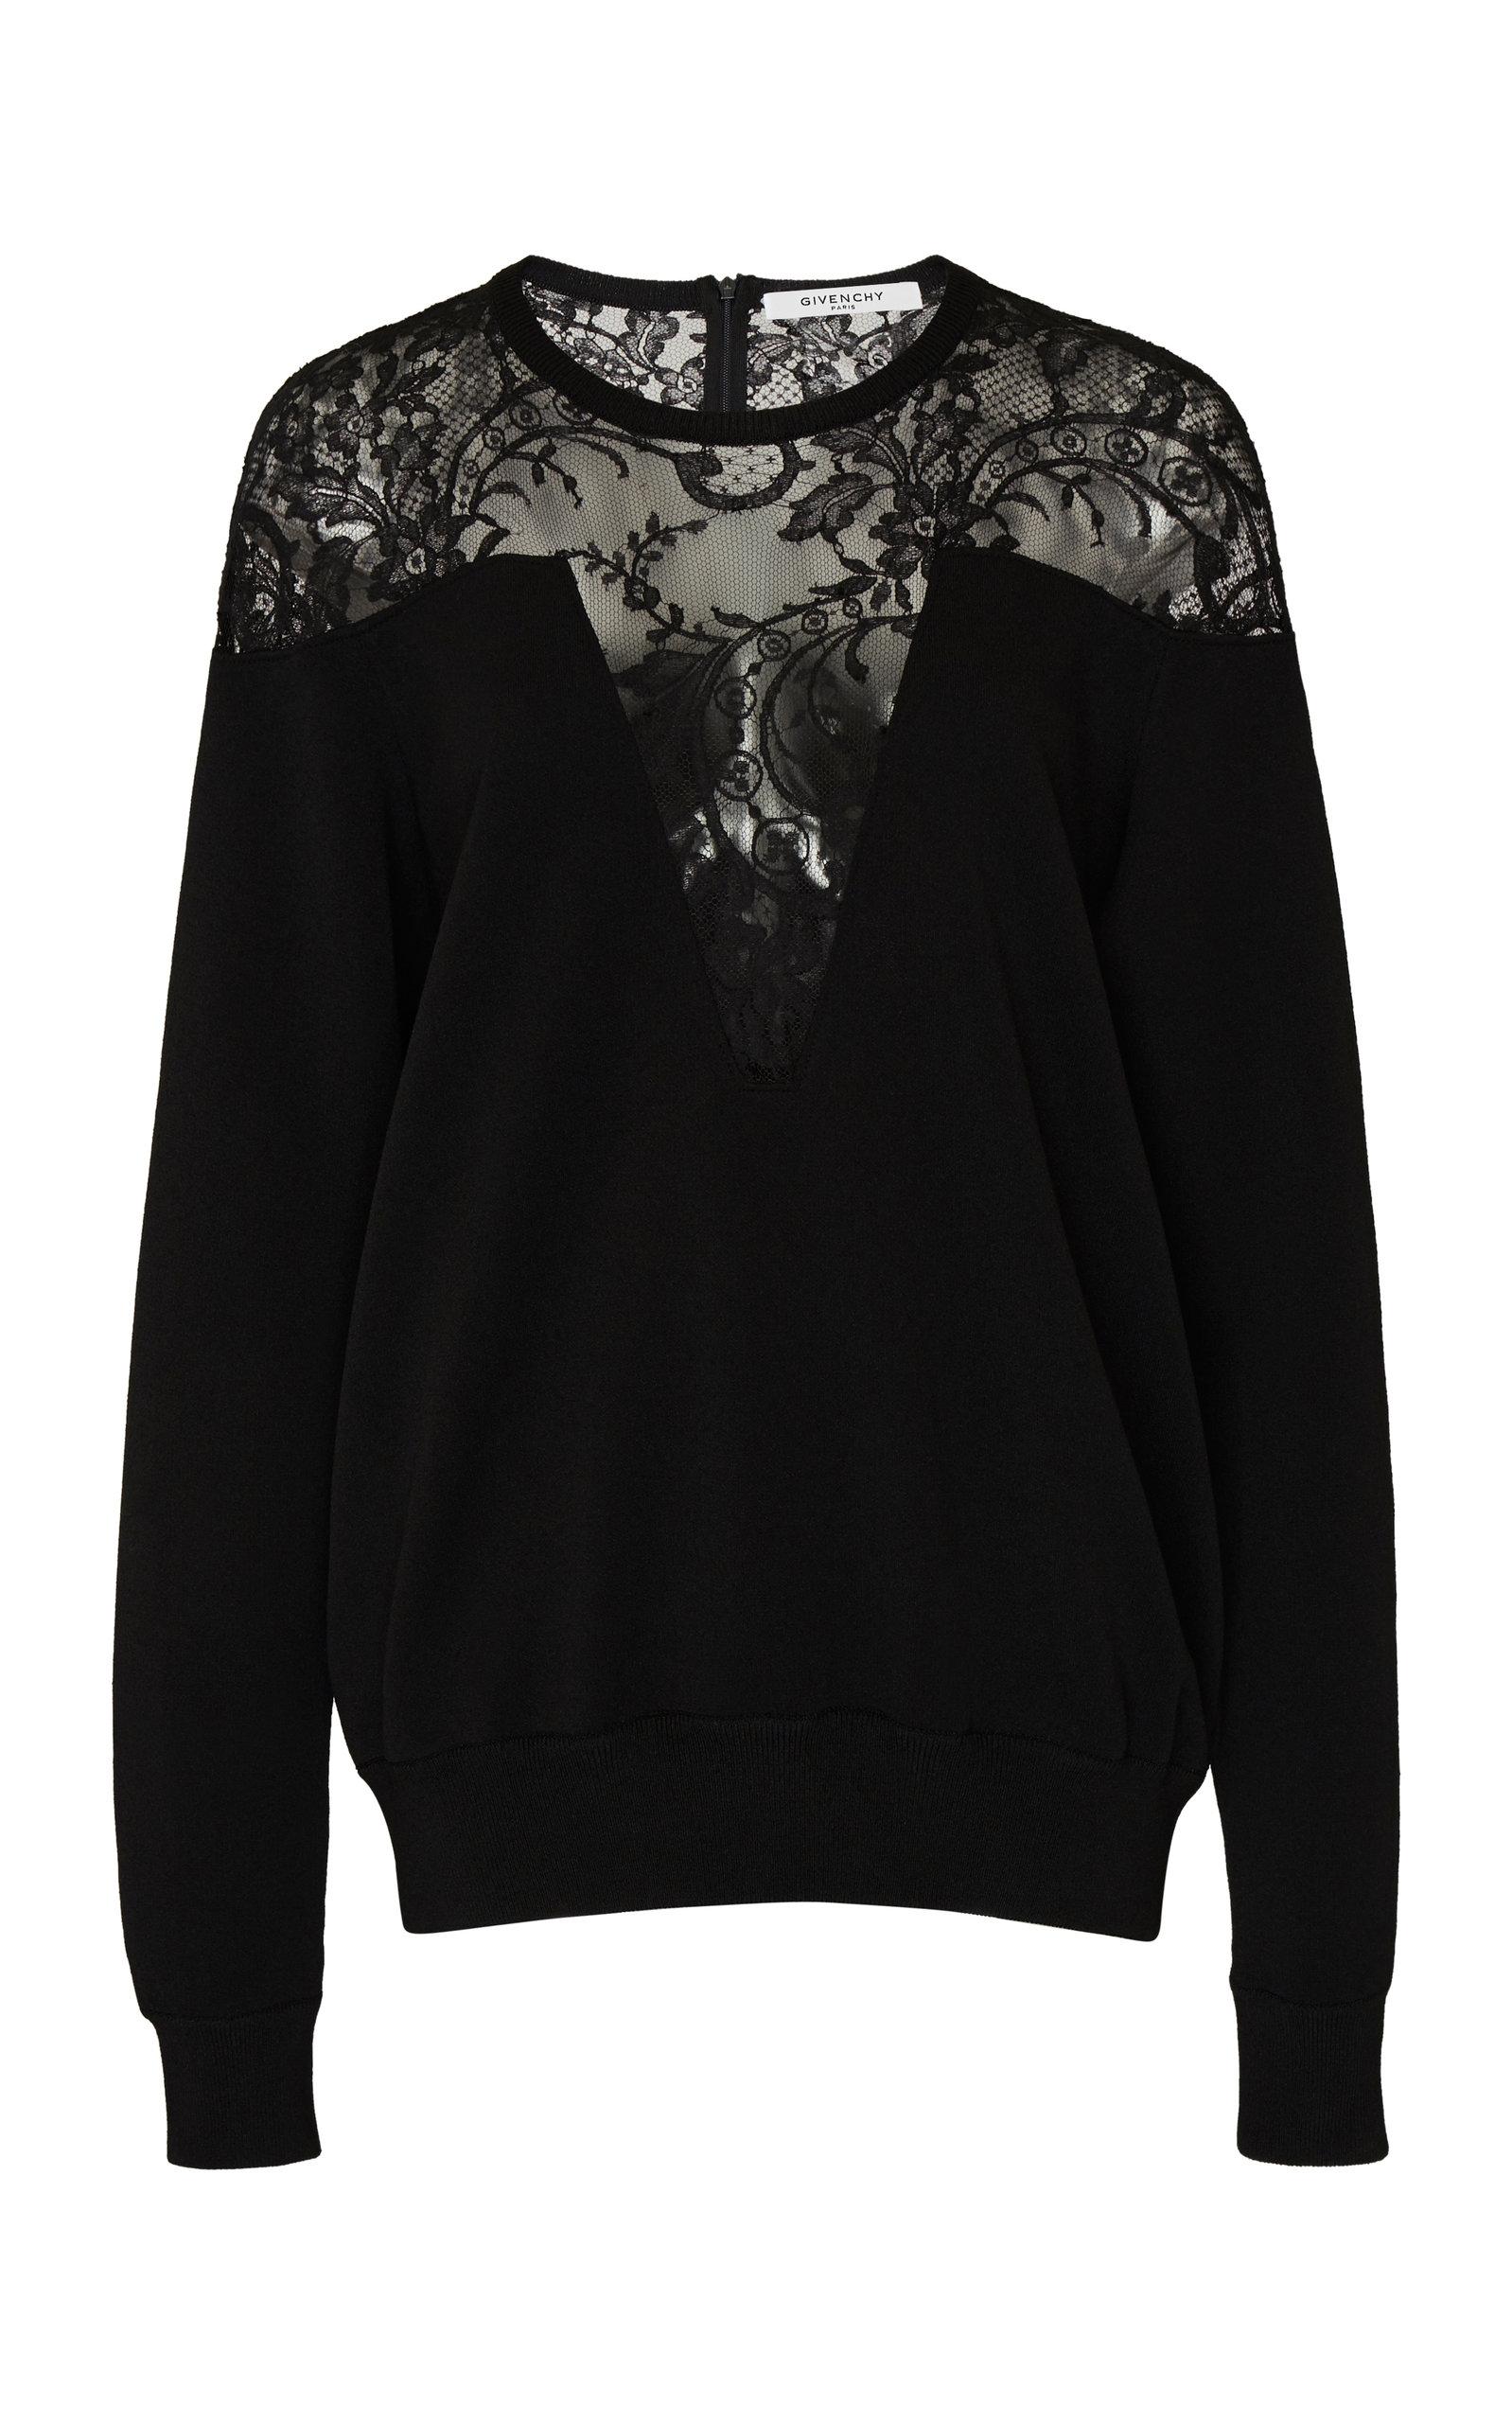 GIVENCHY | Givenchy Lace-Paneled Crepe Top | Goxip